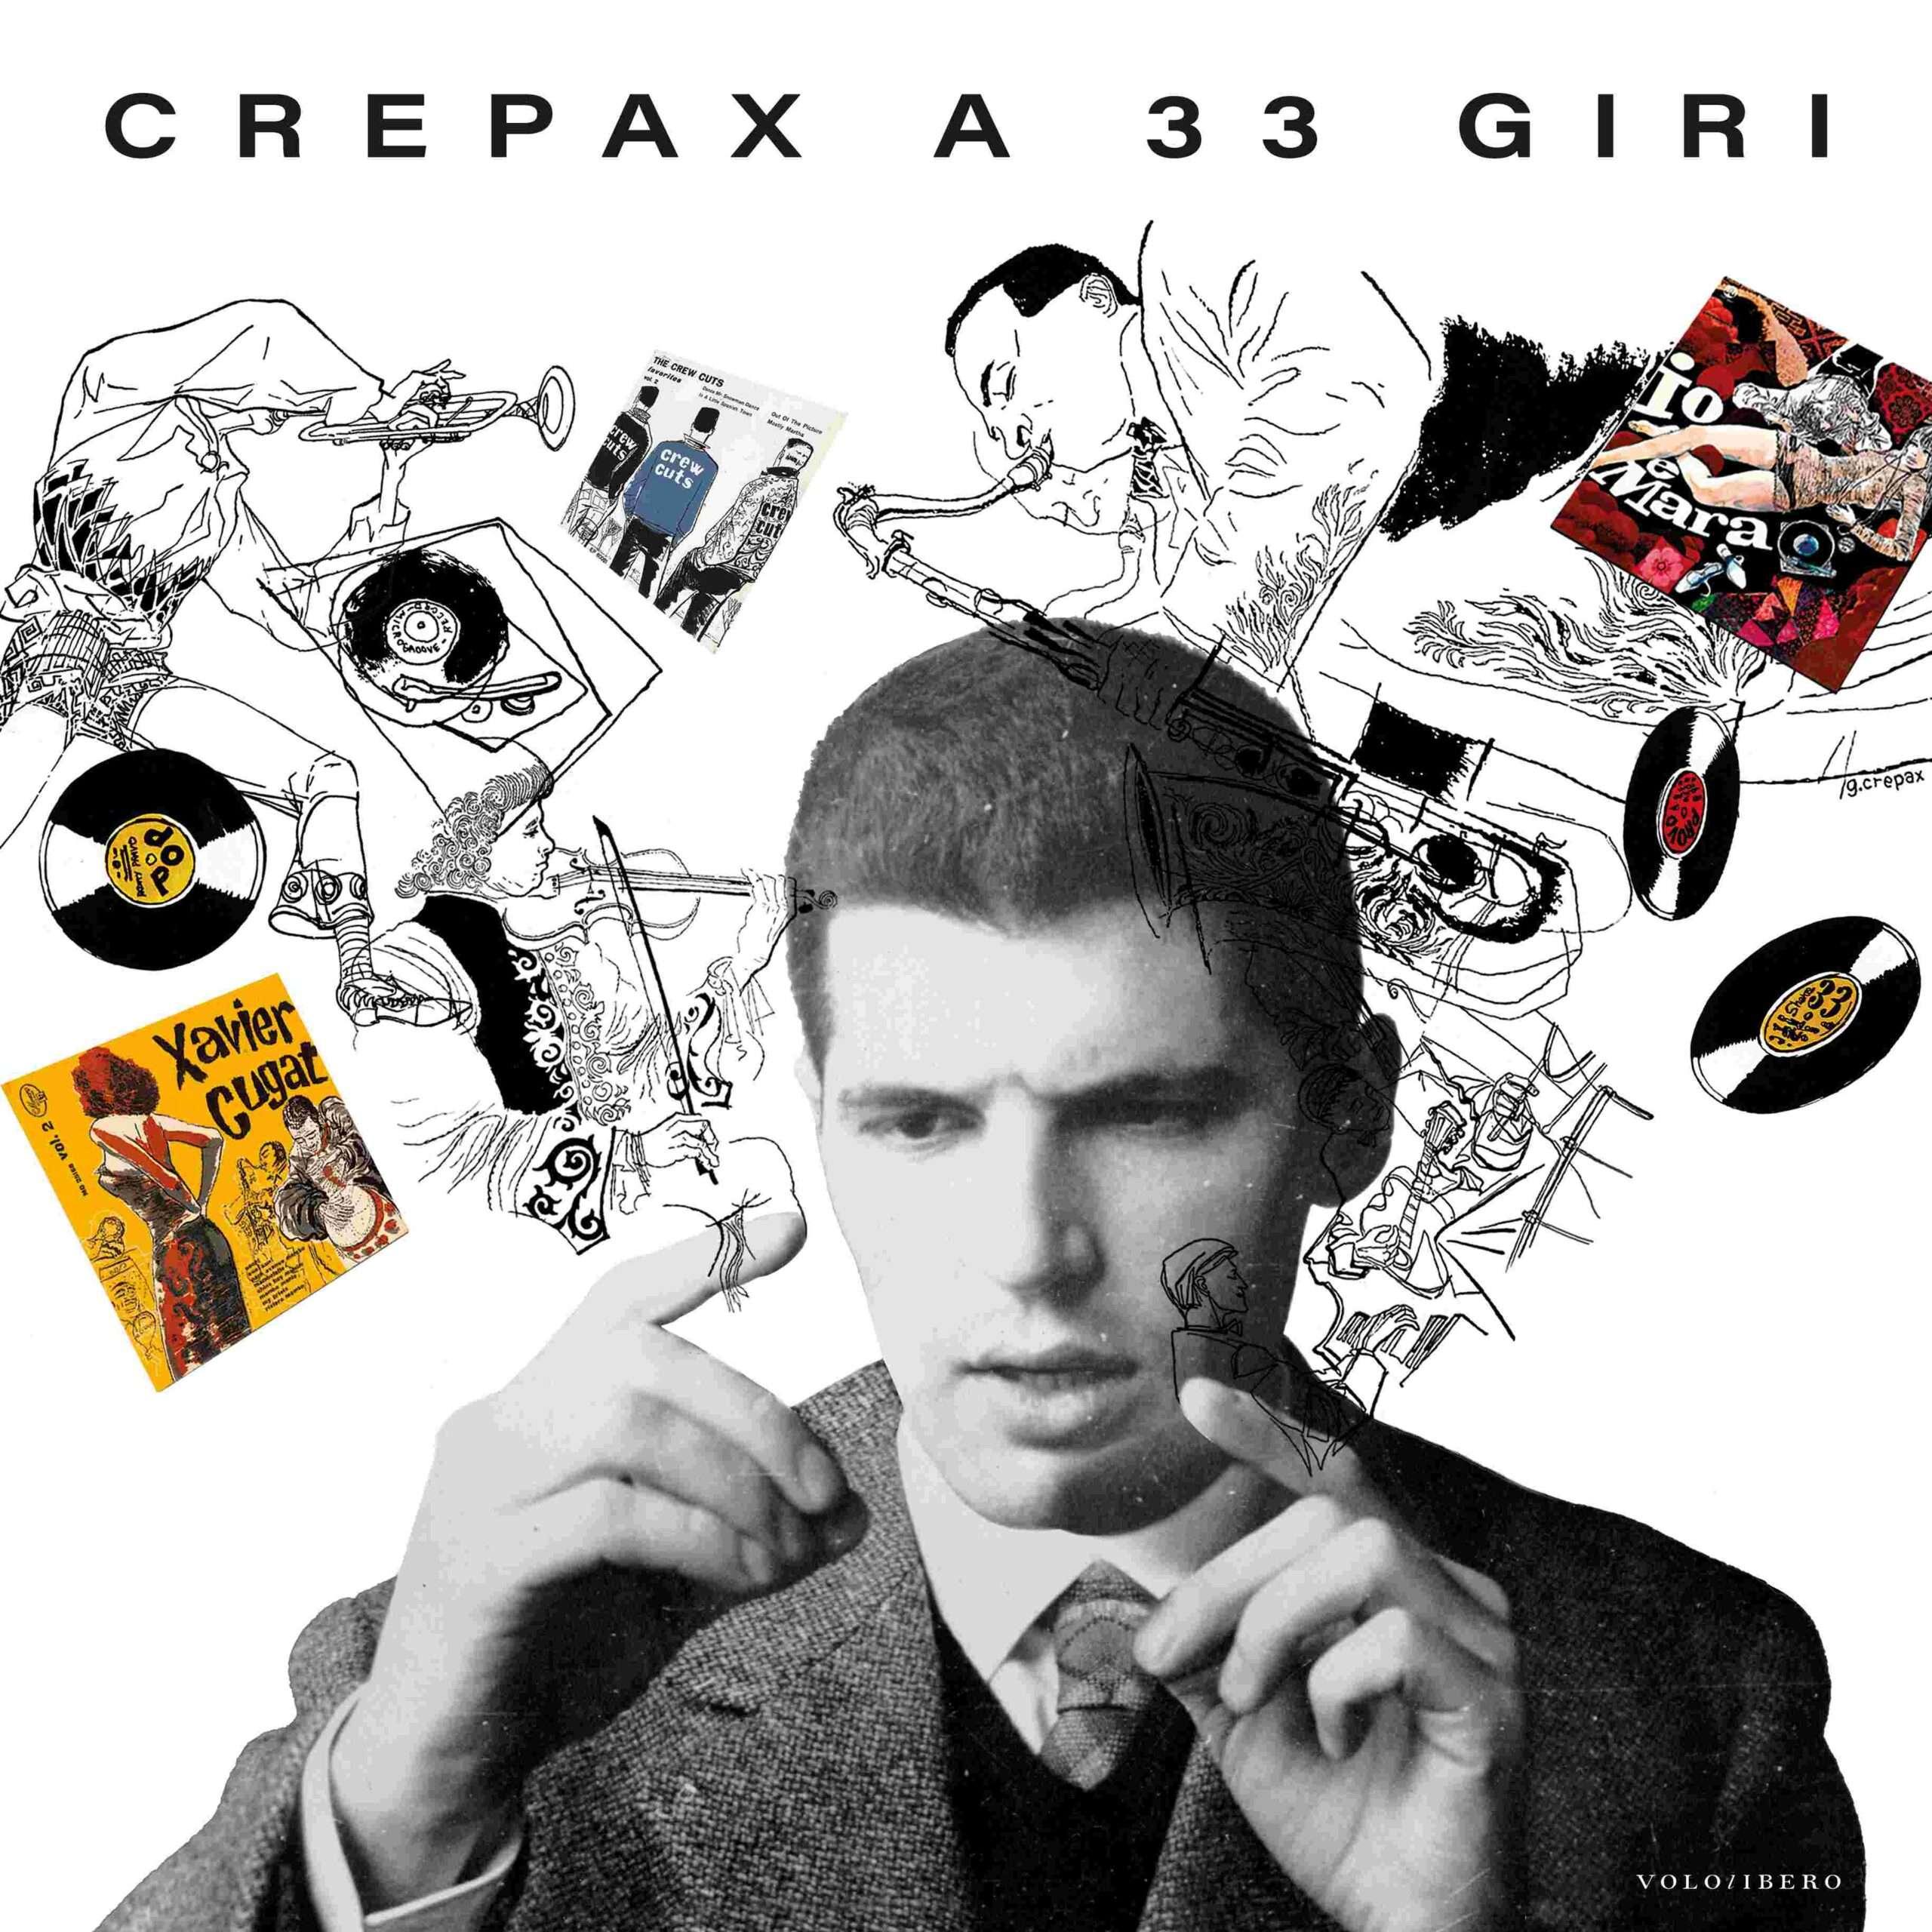 CREPAX A 33 giri